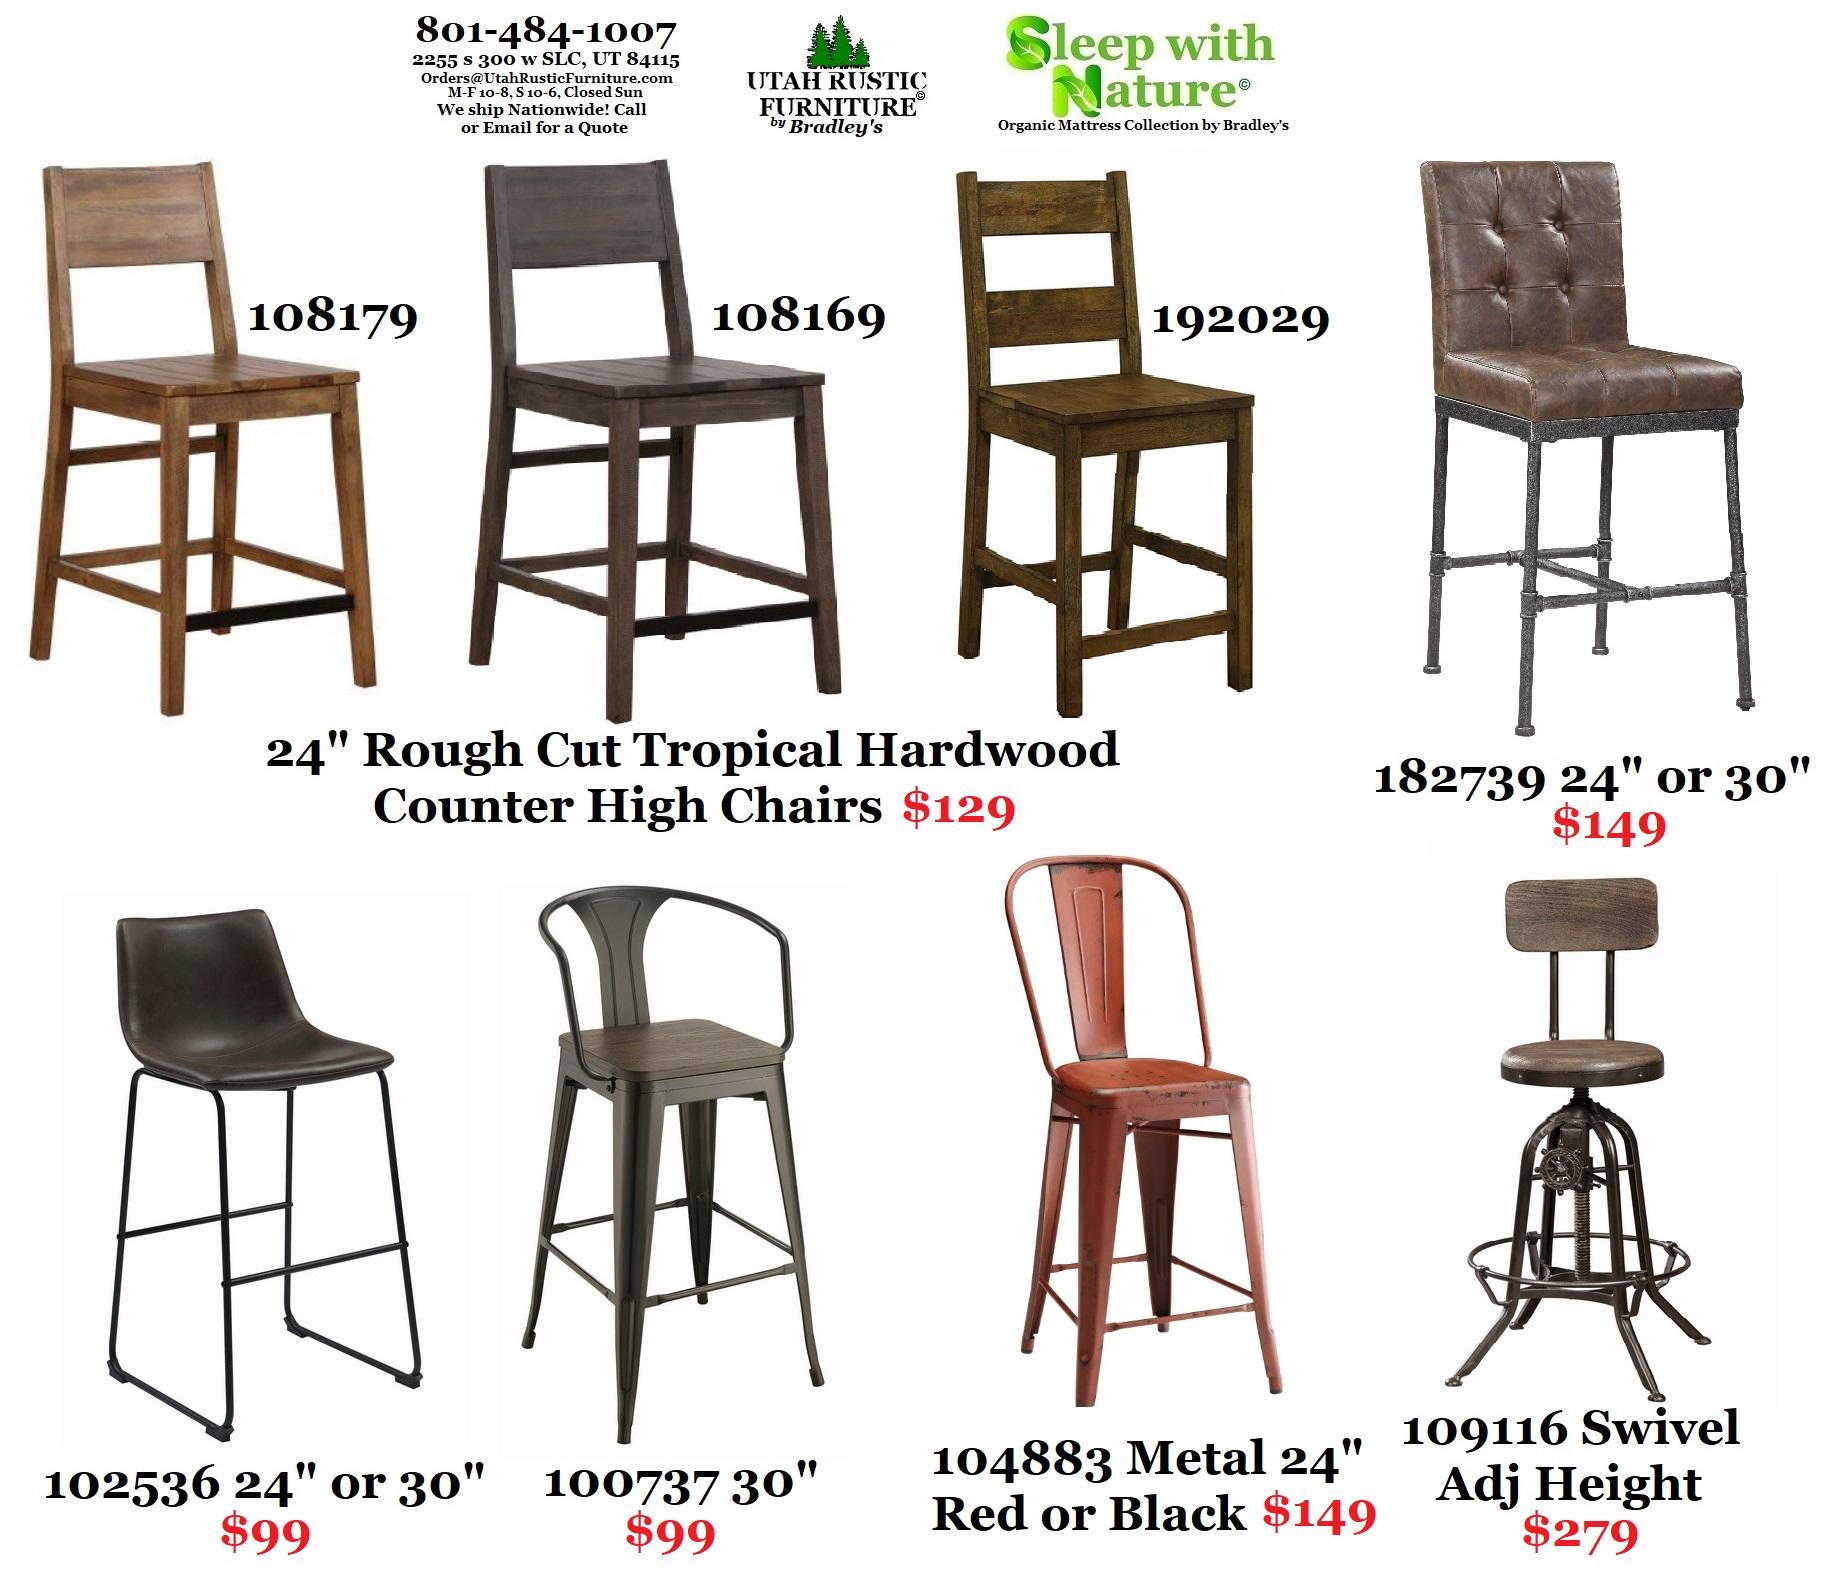 Phenomenal Bradleys Furniture Etc Utah Rustic Dining Room Furniture Pdpeps Interior Chair Design Pdpepsorg